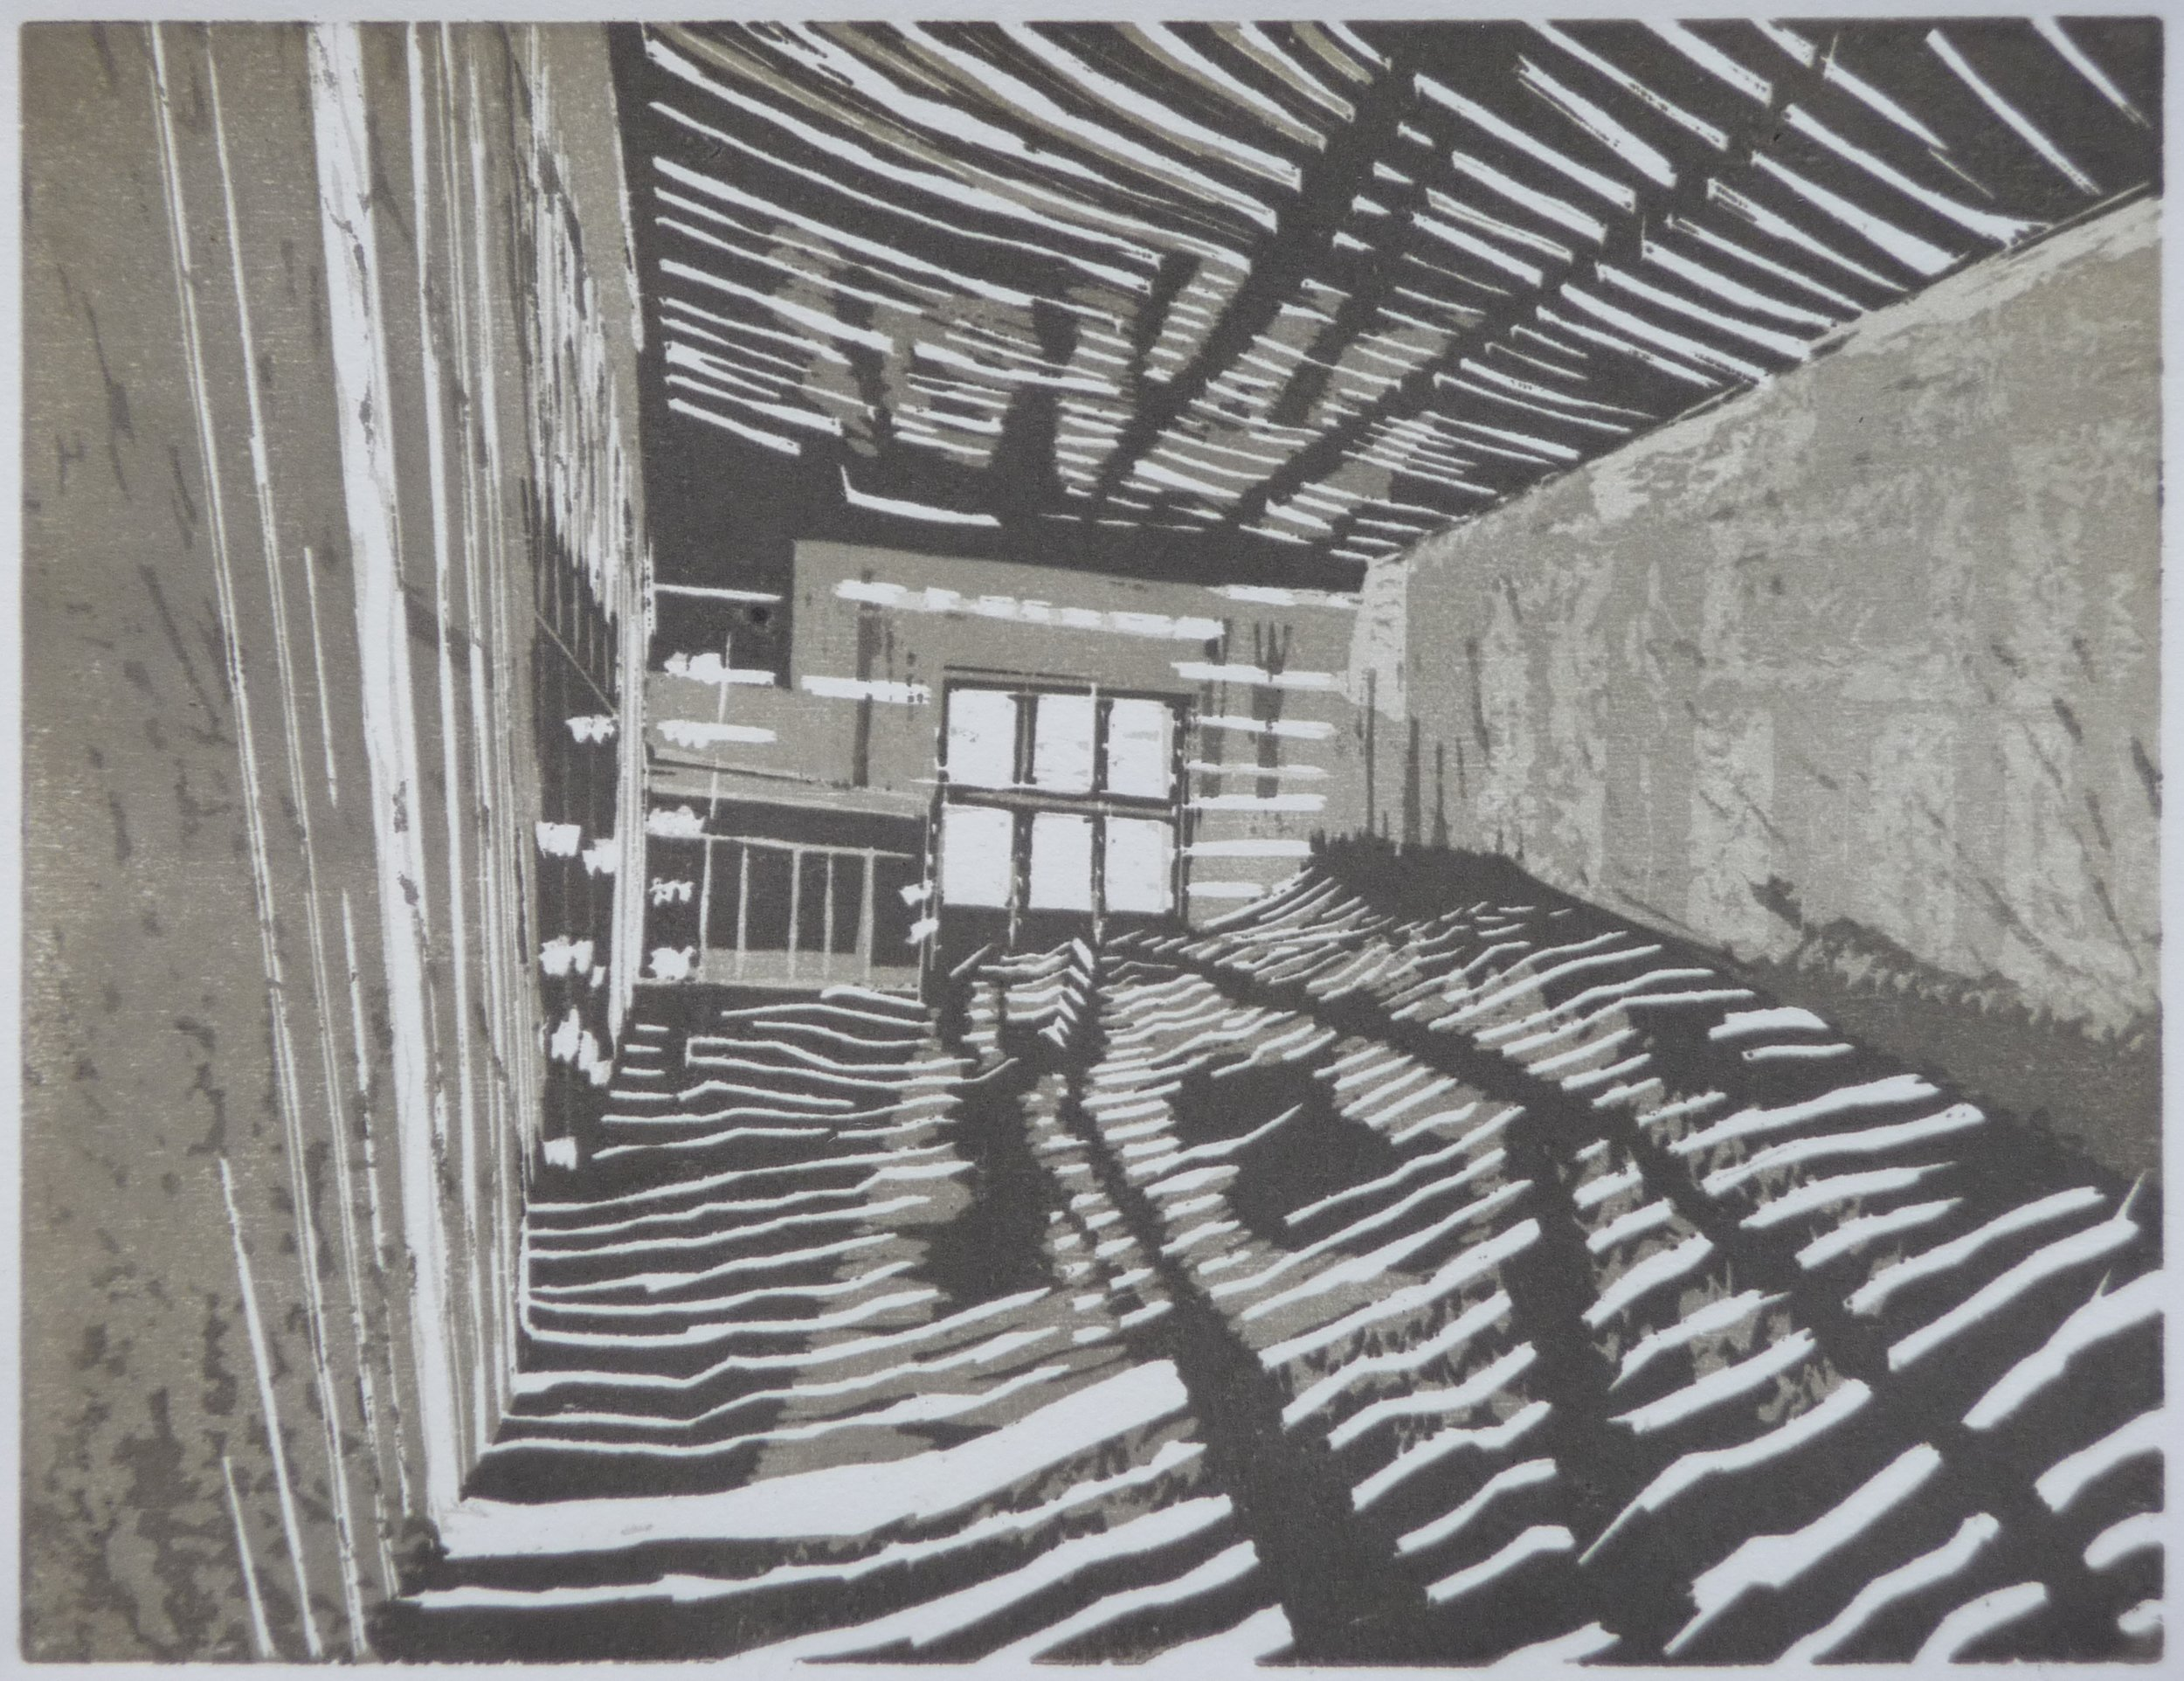 Raum, woodcut, 23 x 30 cm, 2014